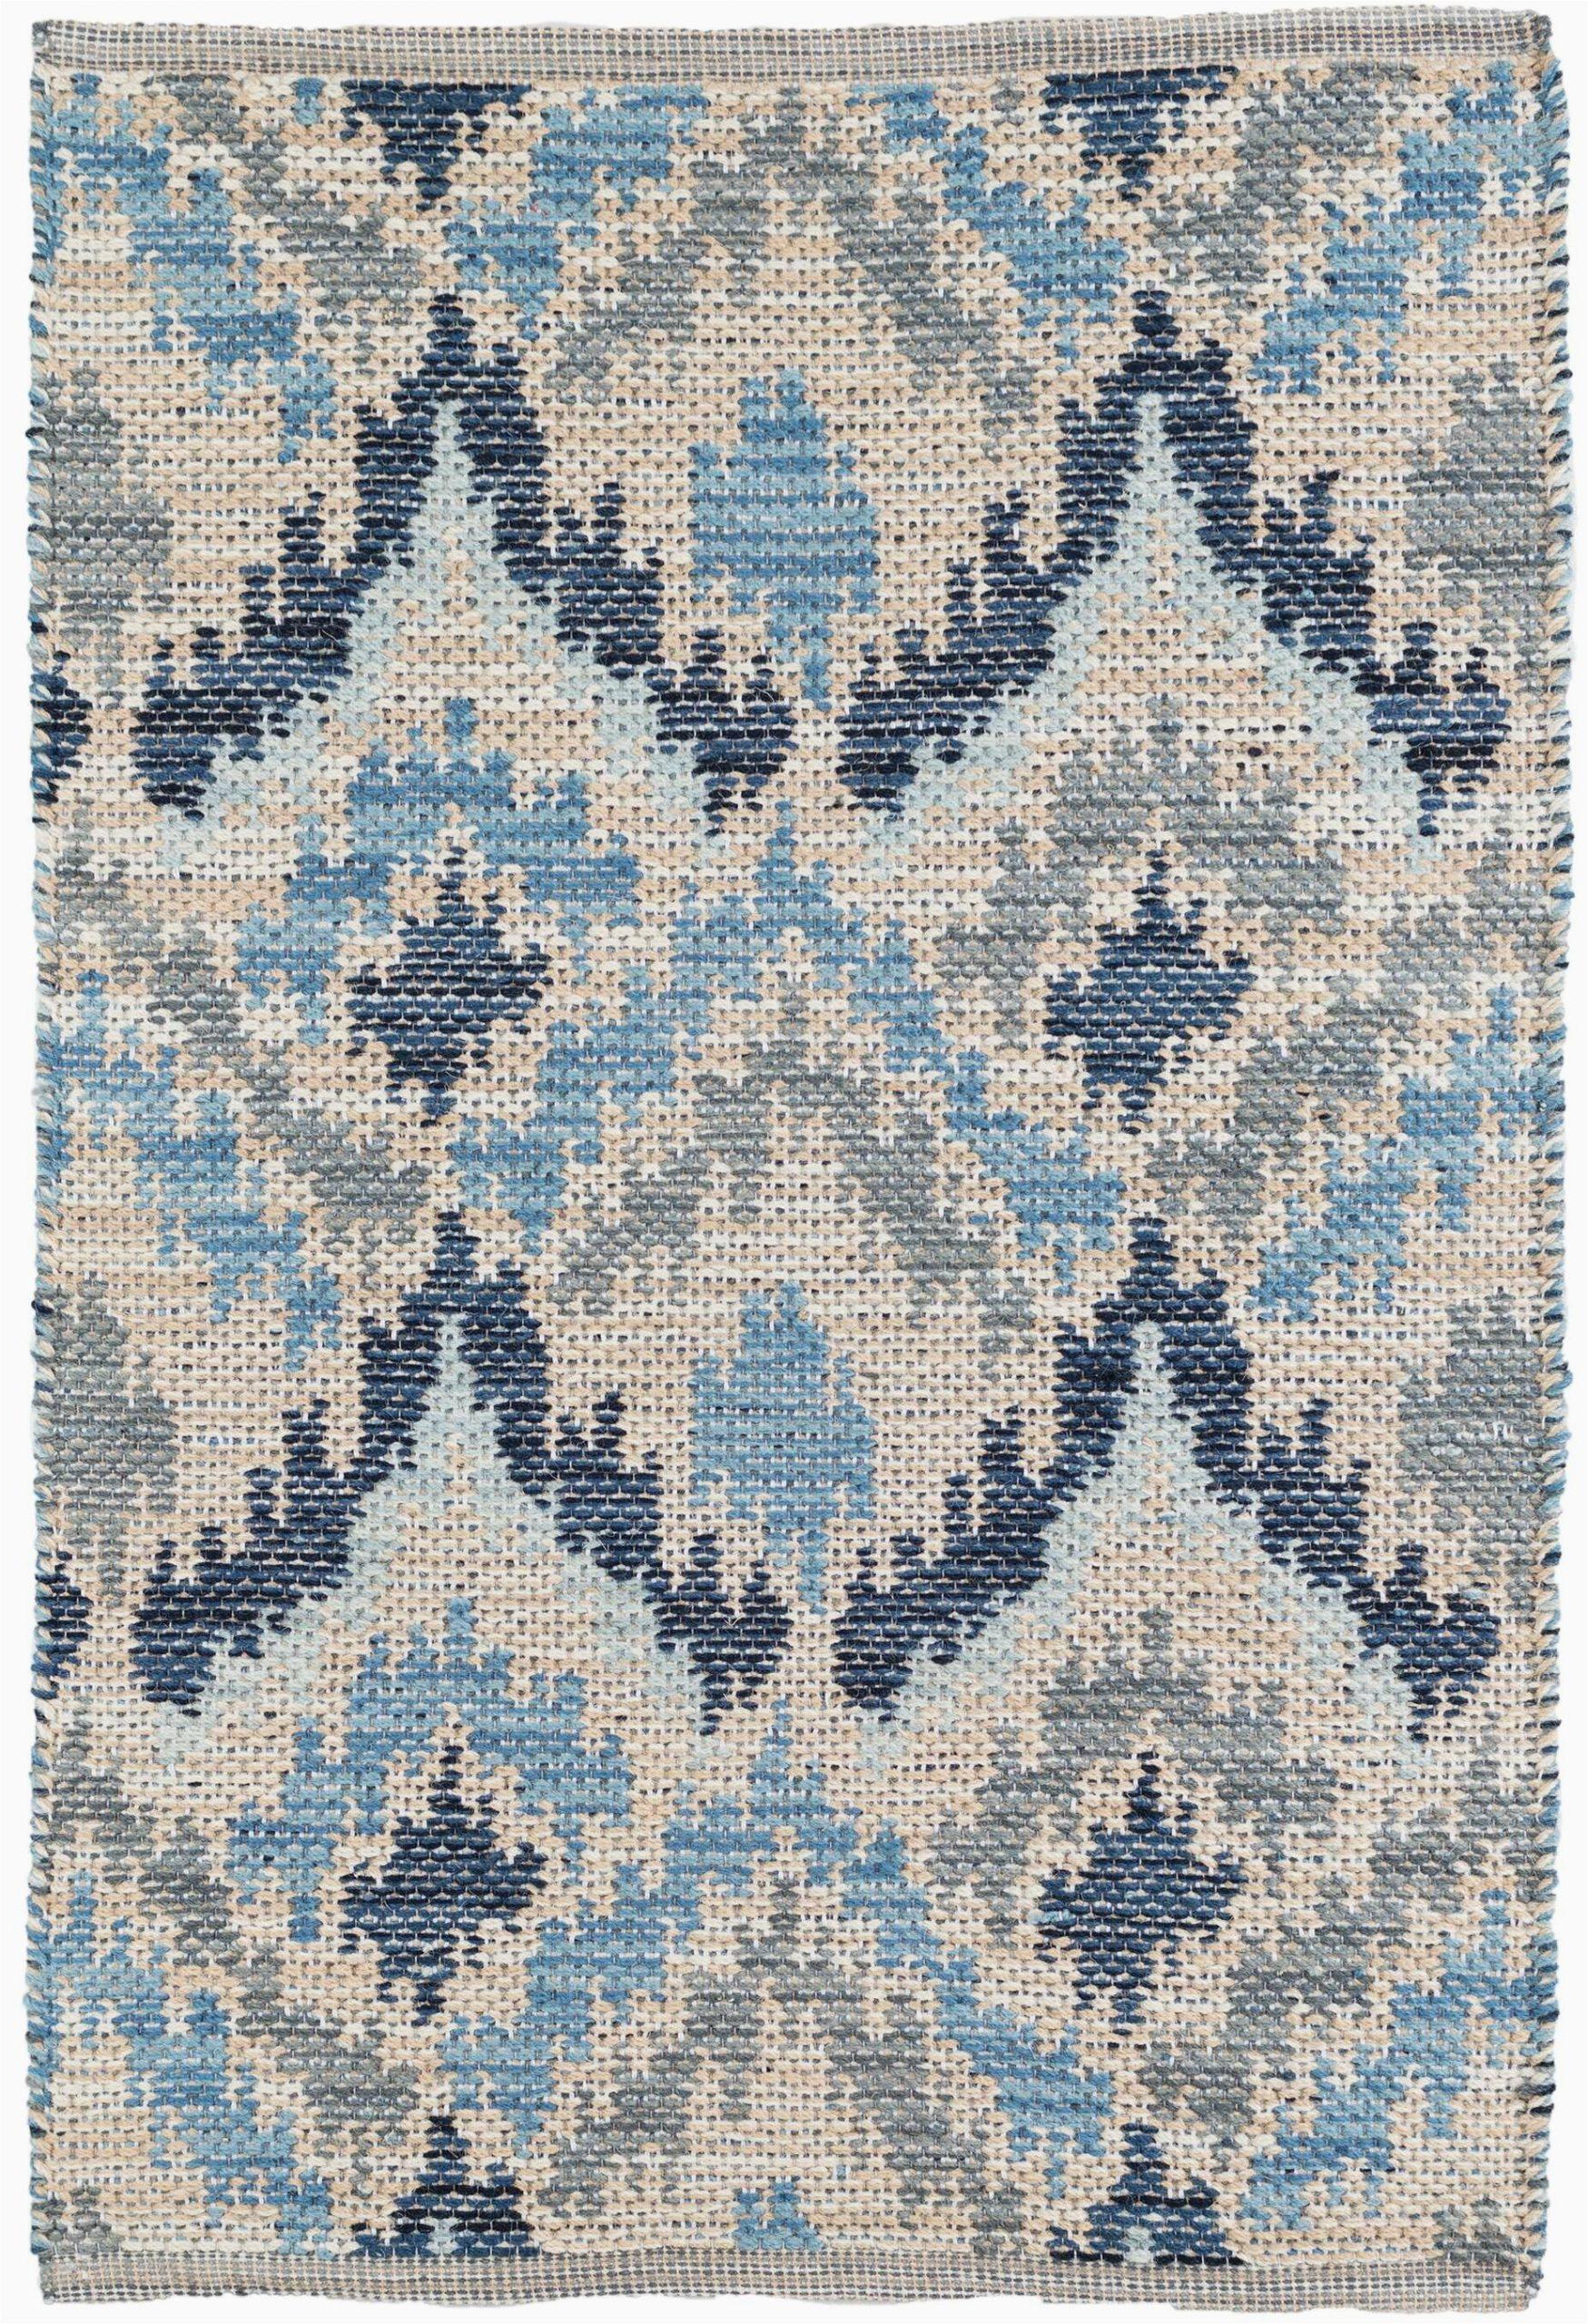 Flat Weave Blue Rug Medina Ikat Handmade Flatweave Blue Gray Cream area Rug